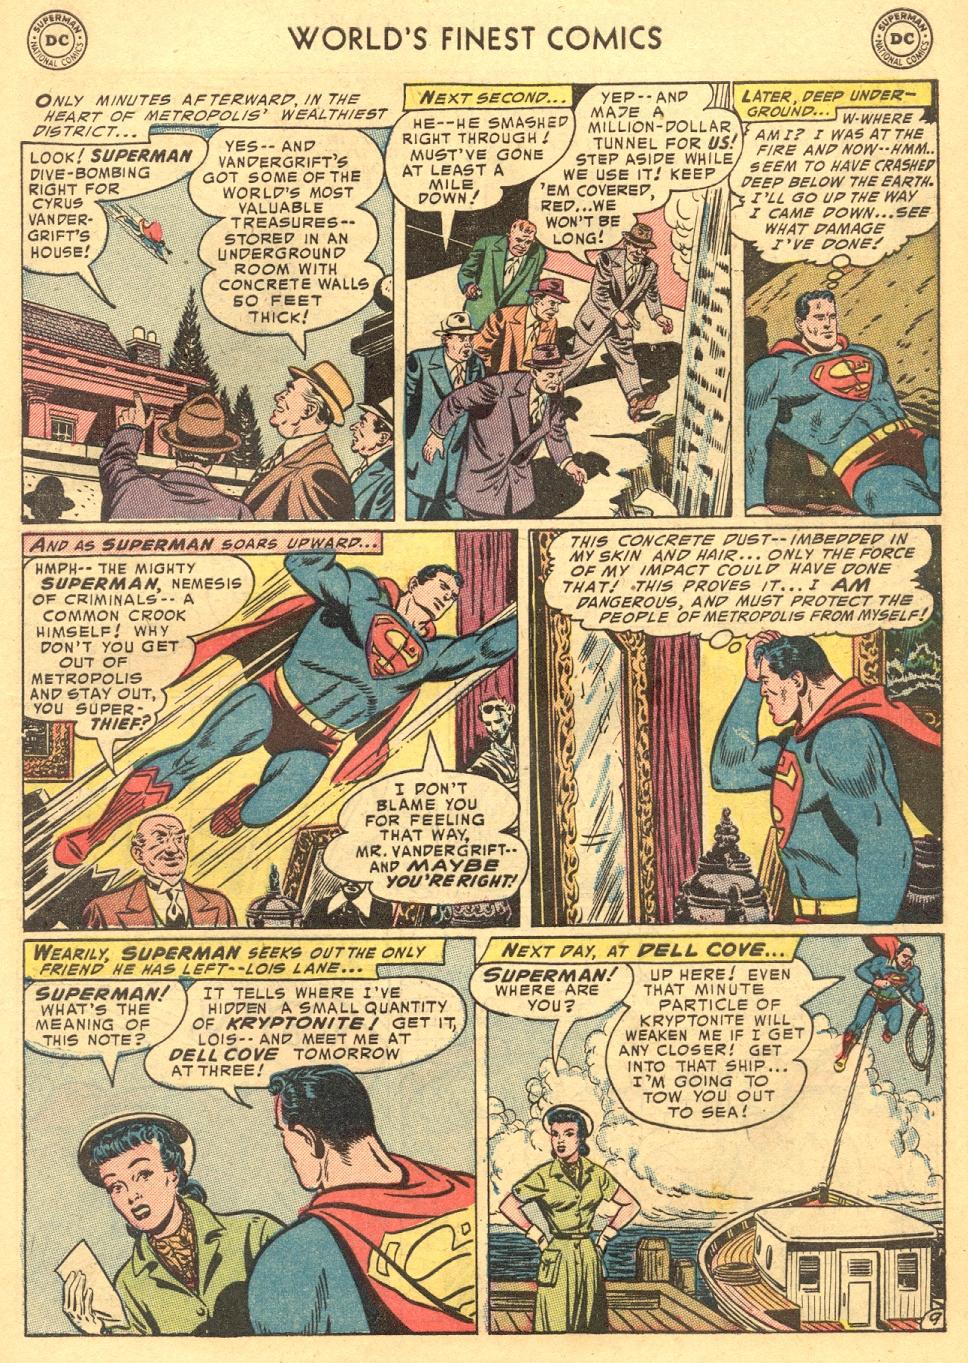 Read online World's Finest Comics comic -  Issue #70 - 11